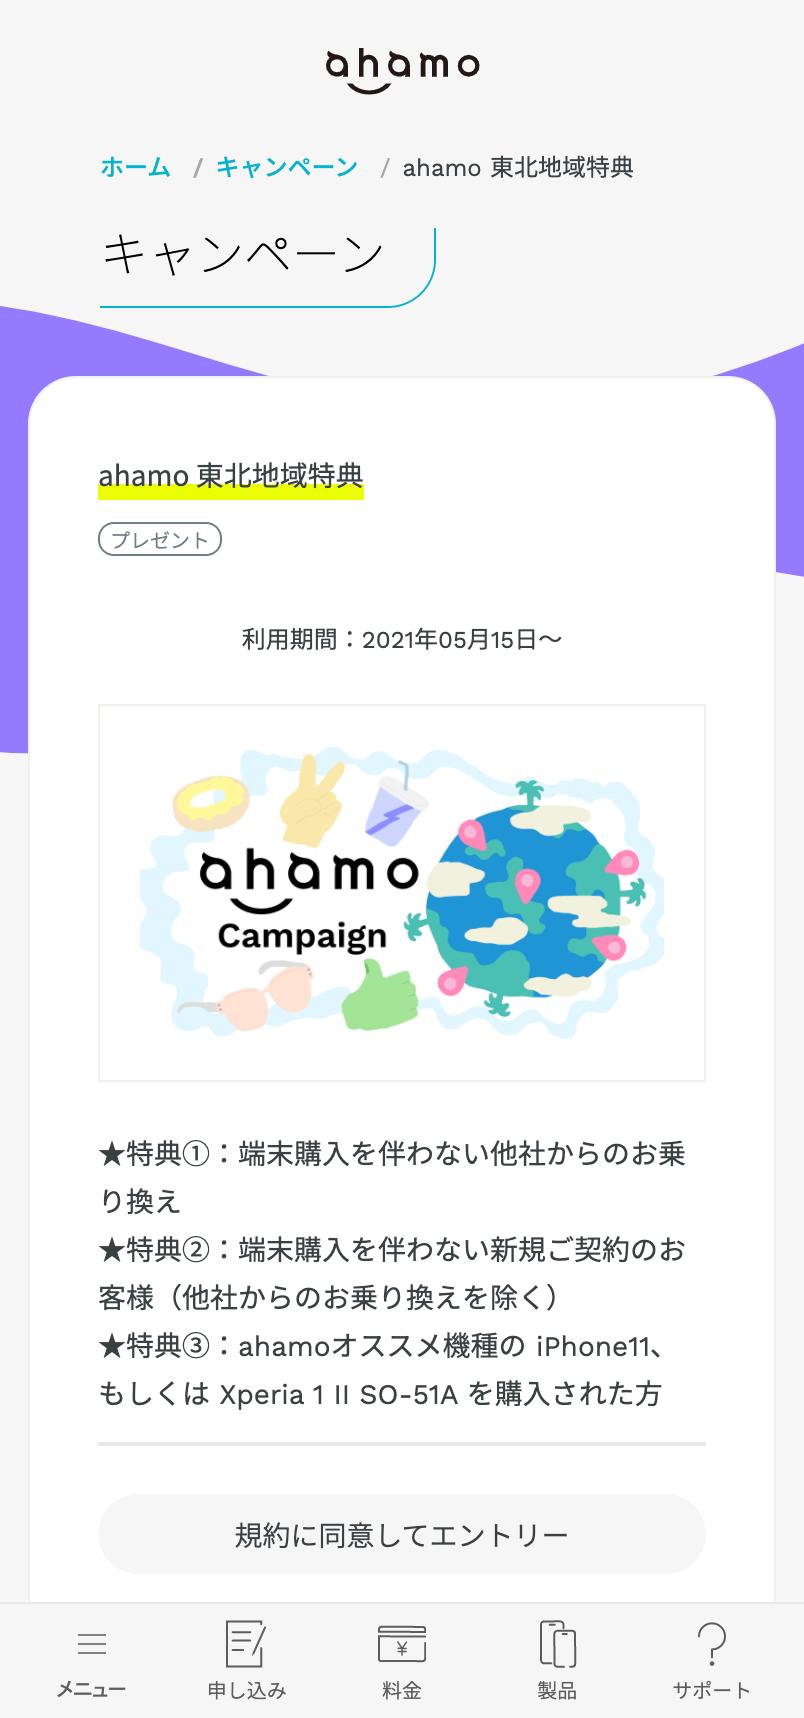 ahamo東北限定キャンペーン